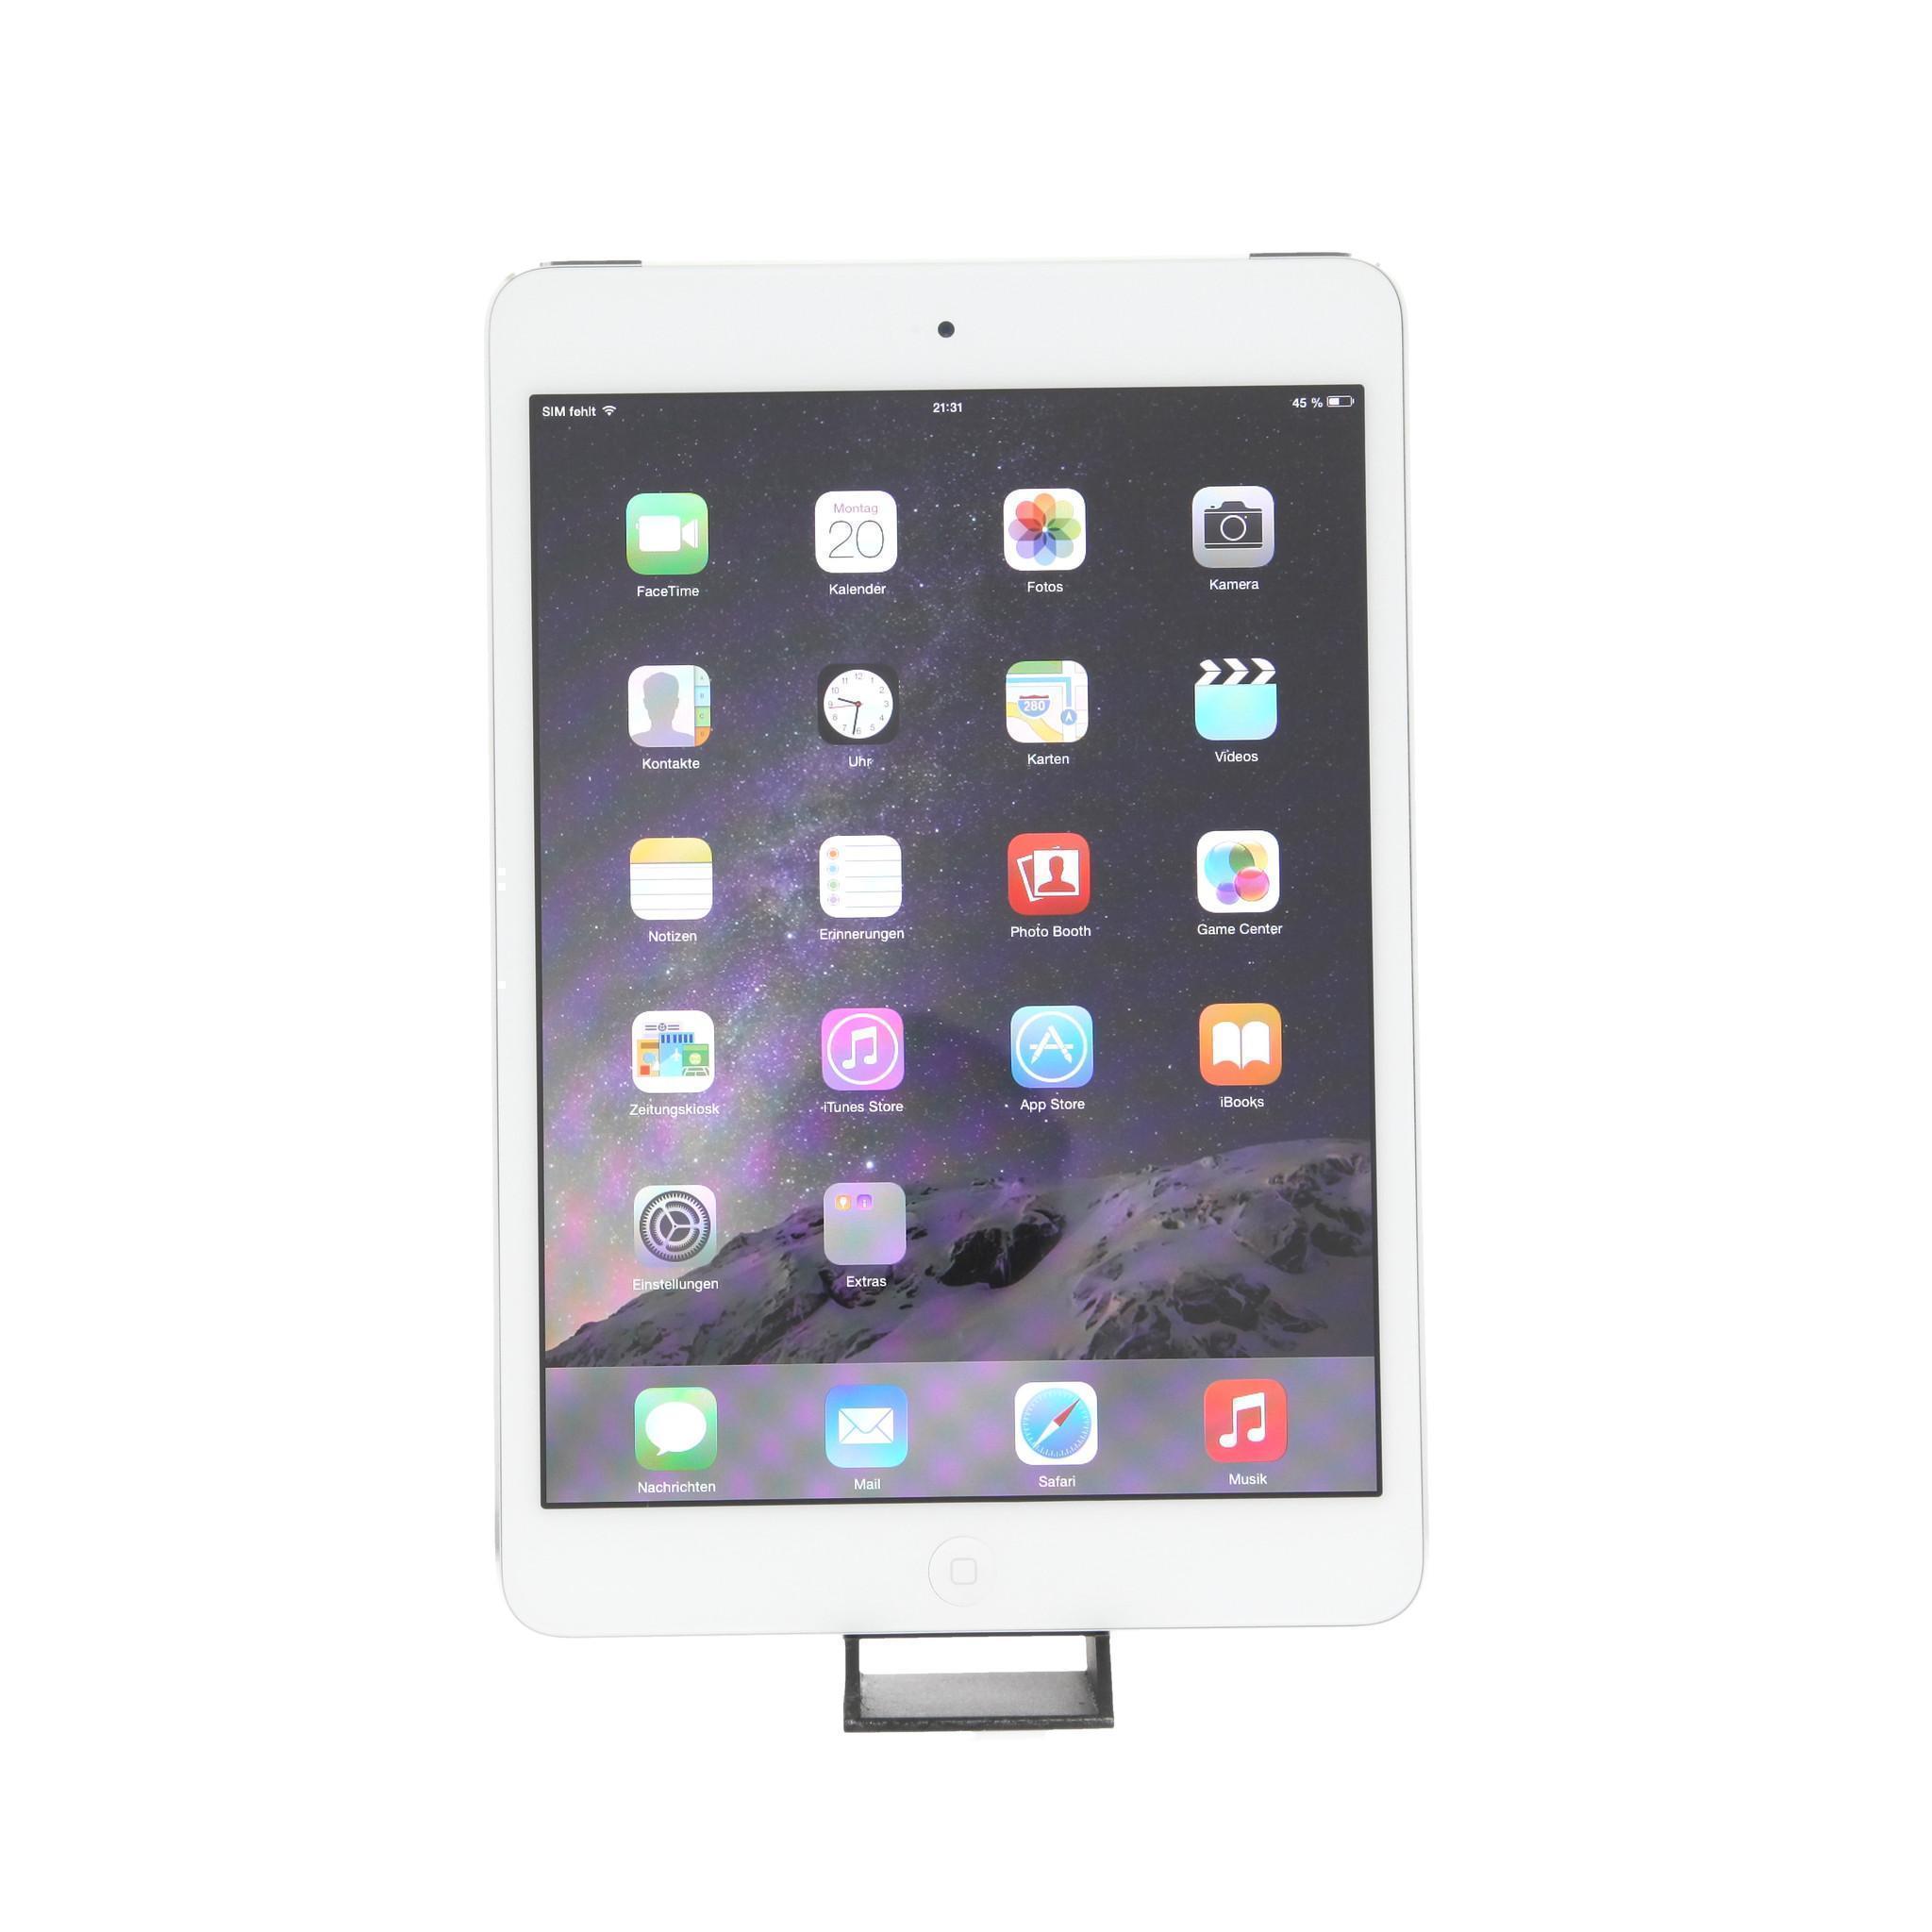 iPad mini 16 Go - Wifi + 4G - Blanc - Débloqué